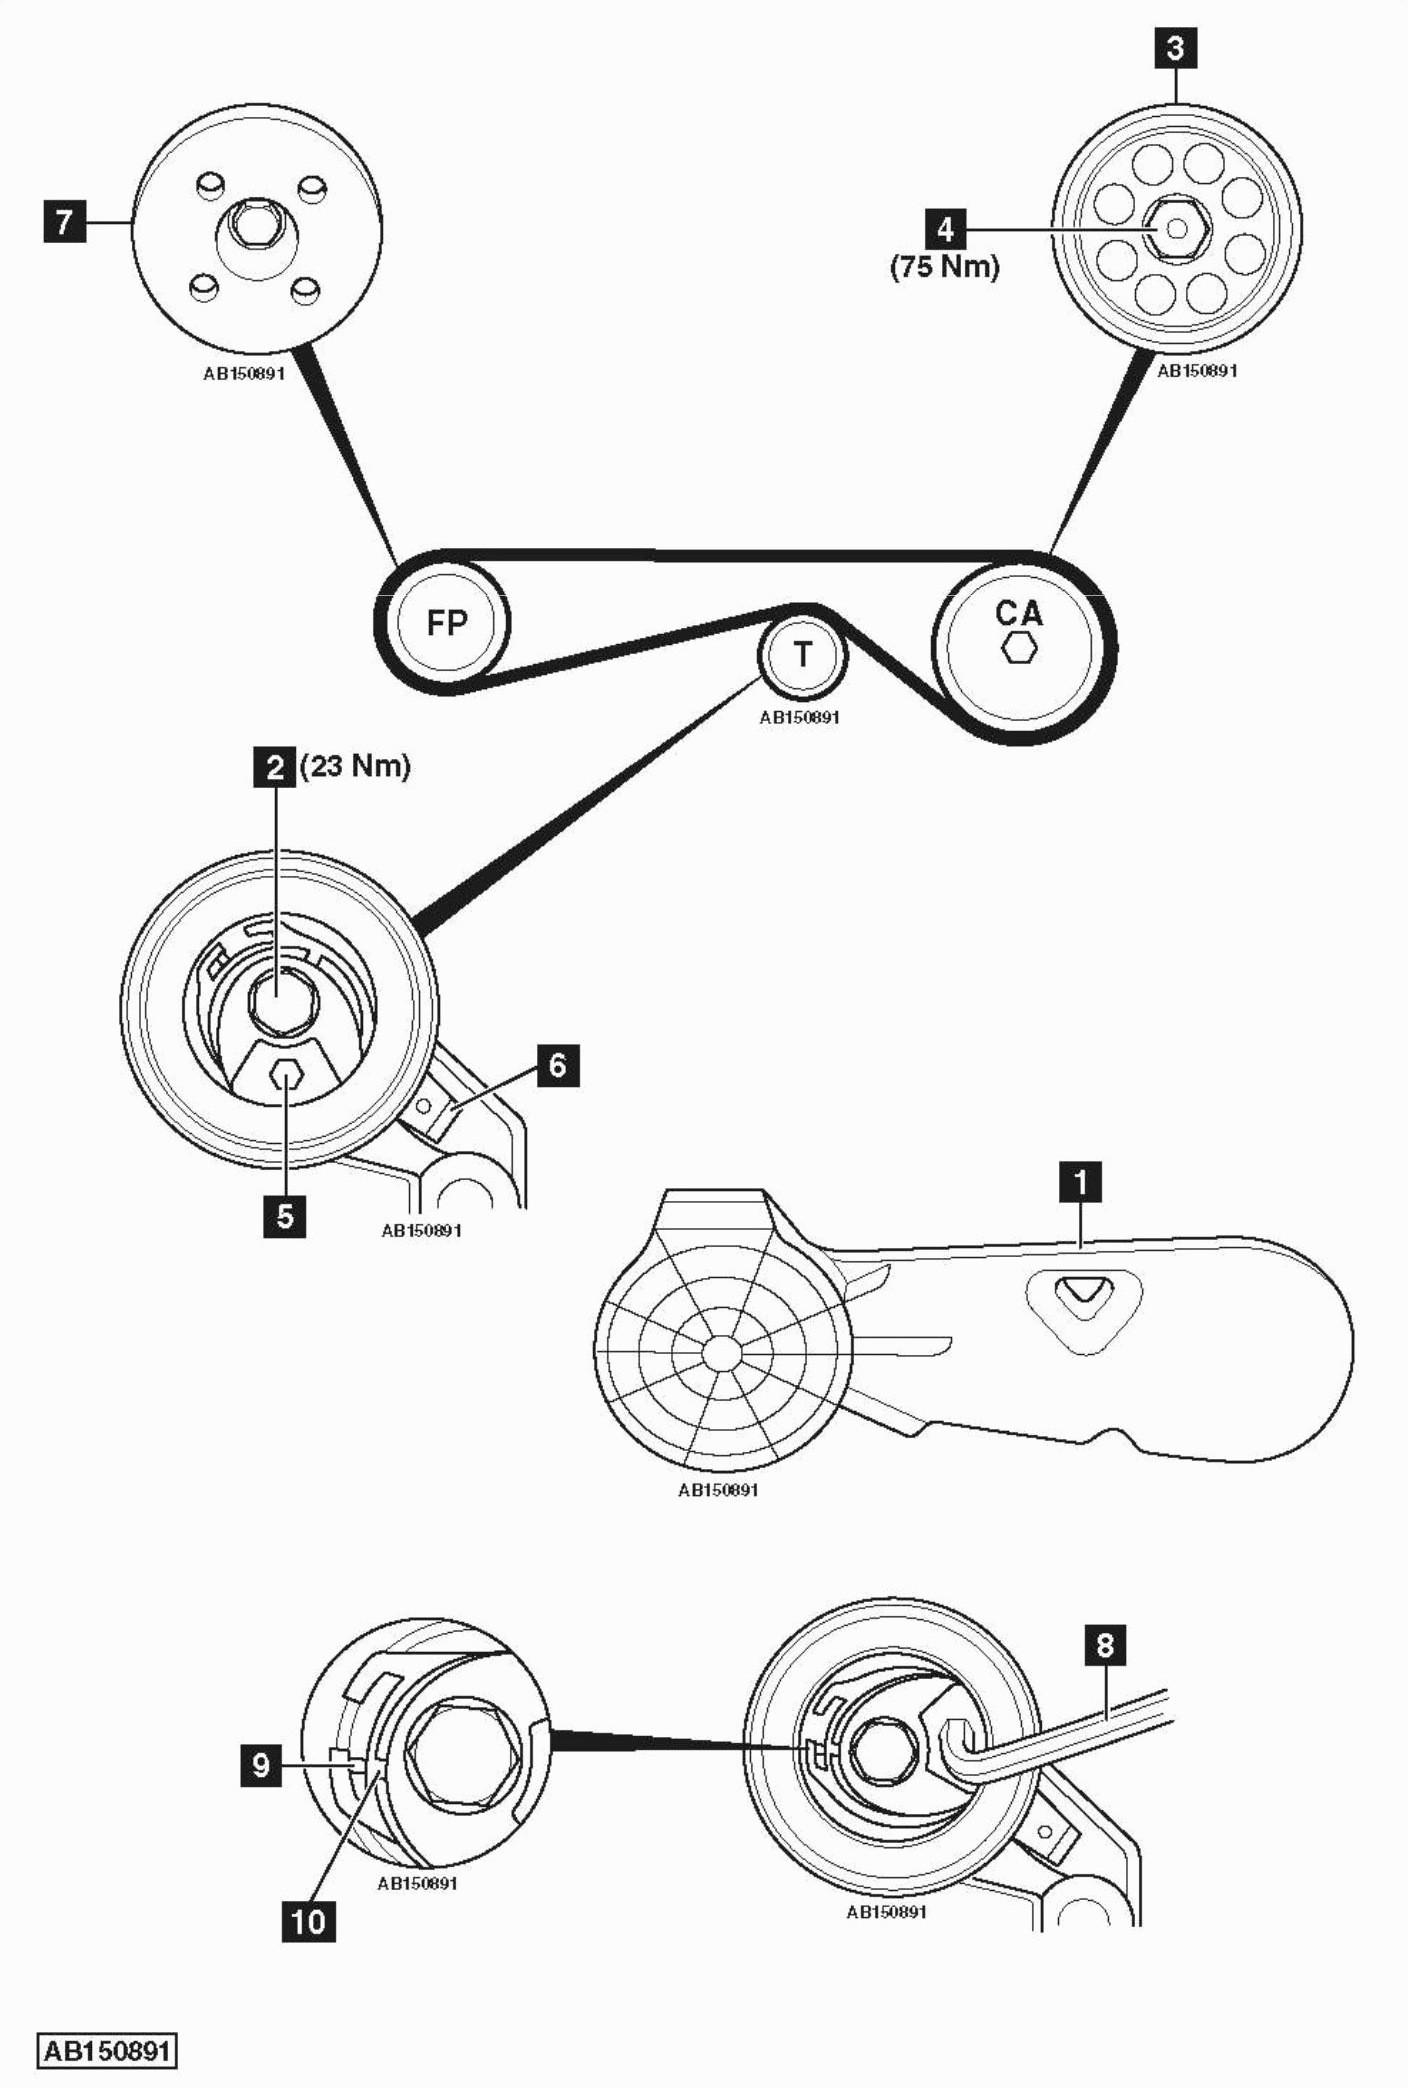 Diagram Of Car Gearbox Bmw Belt Best original Parts for E71 X6 35ix N54 Sac Engine Belt Of Diagram Of Car Gearbox